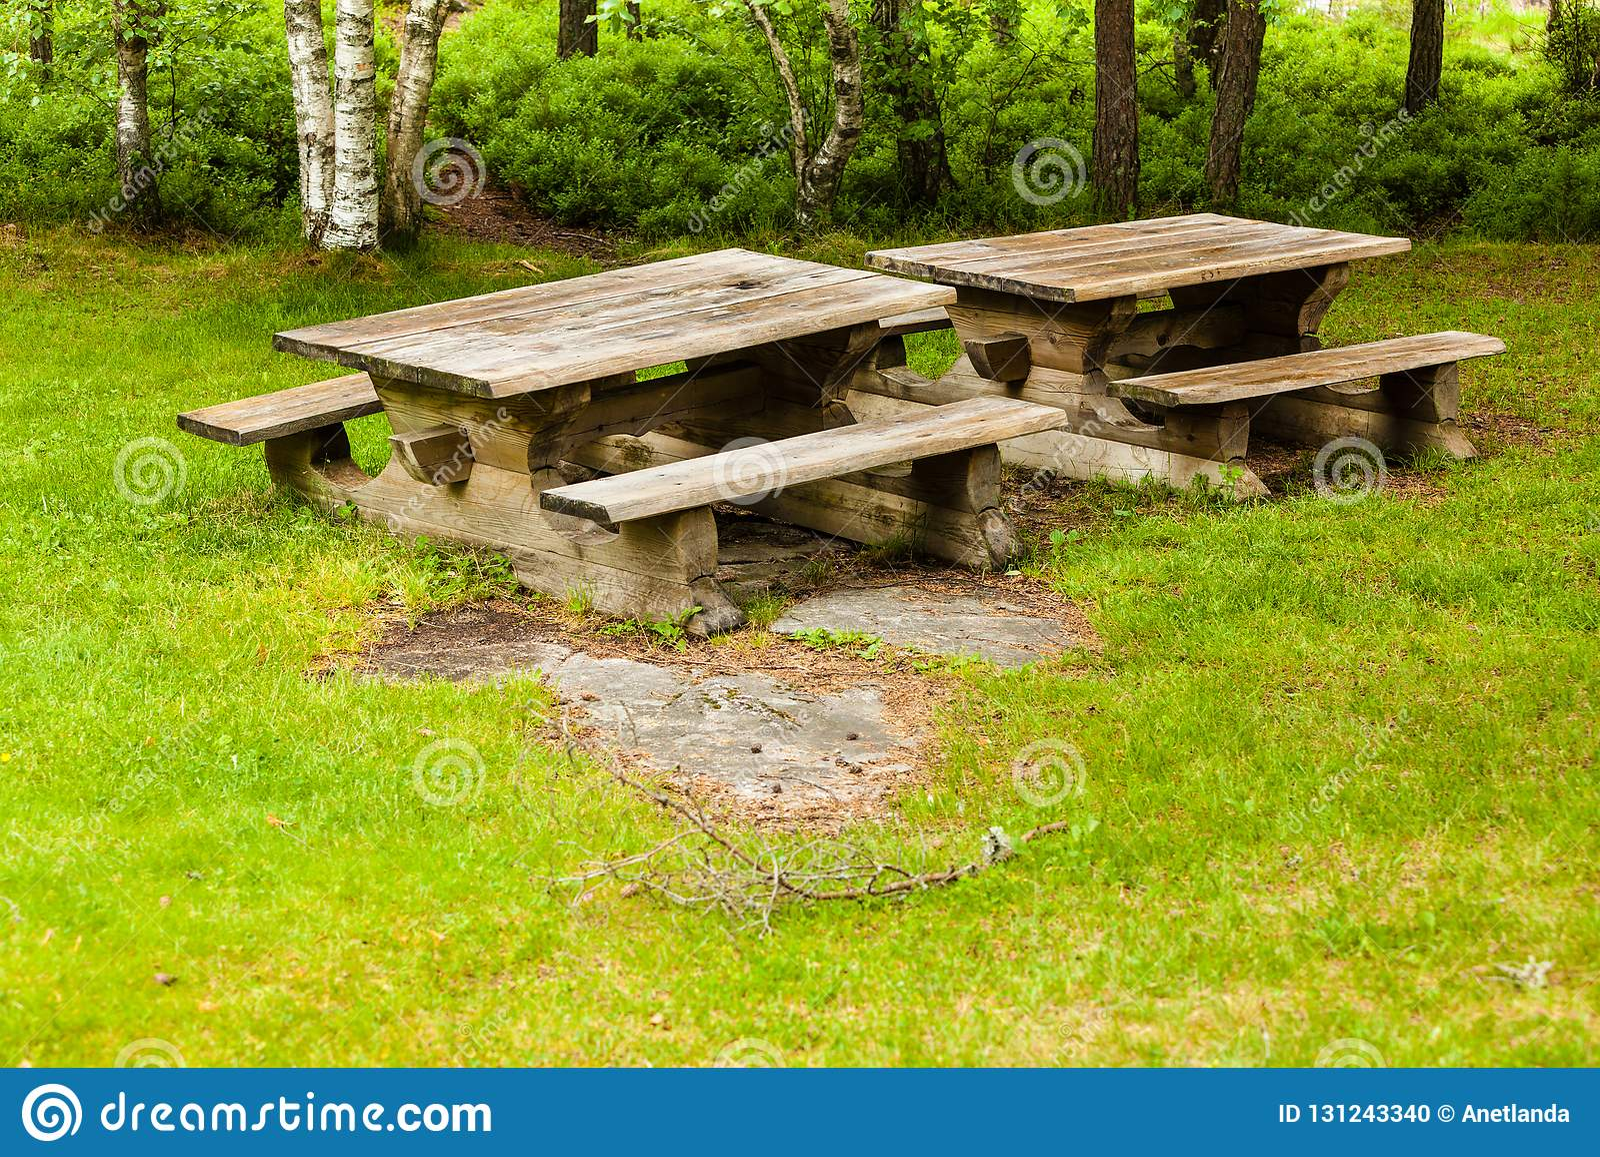 Swell Camp Site With Picnic Table In Norwegian Park Stock Photo Frankydiablos Diy Chair Ideas Frankydiabloscom